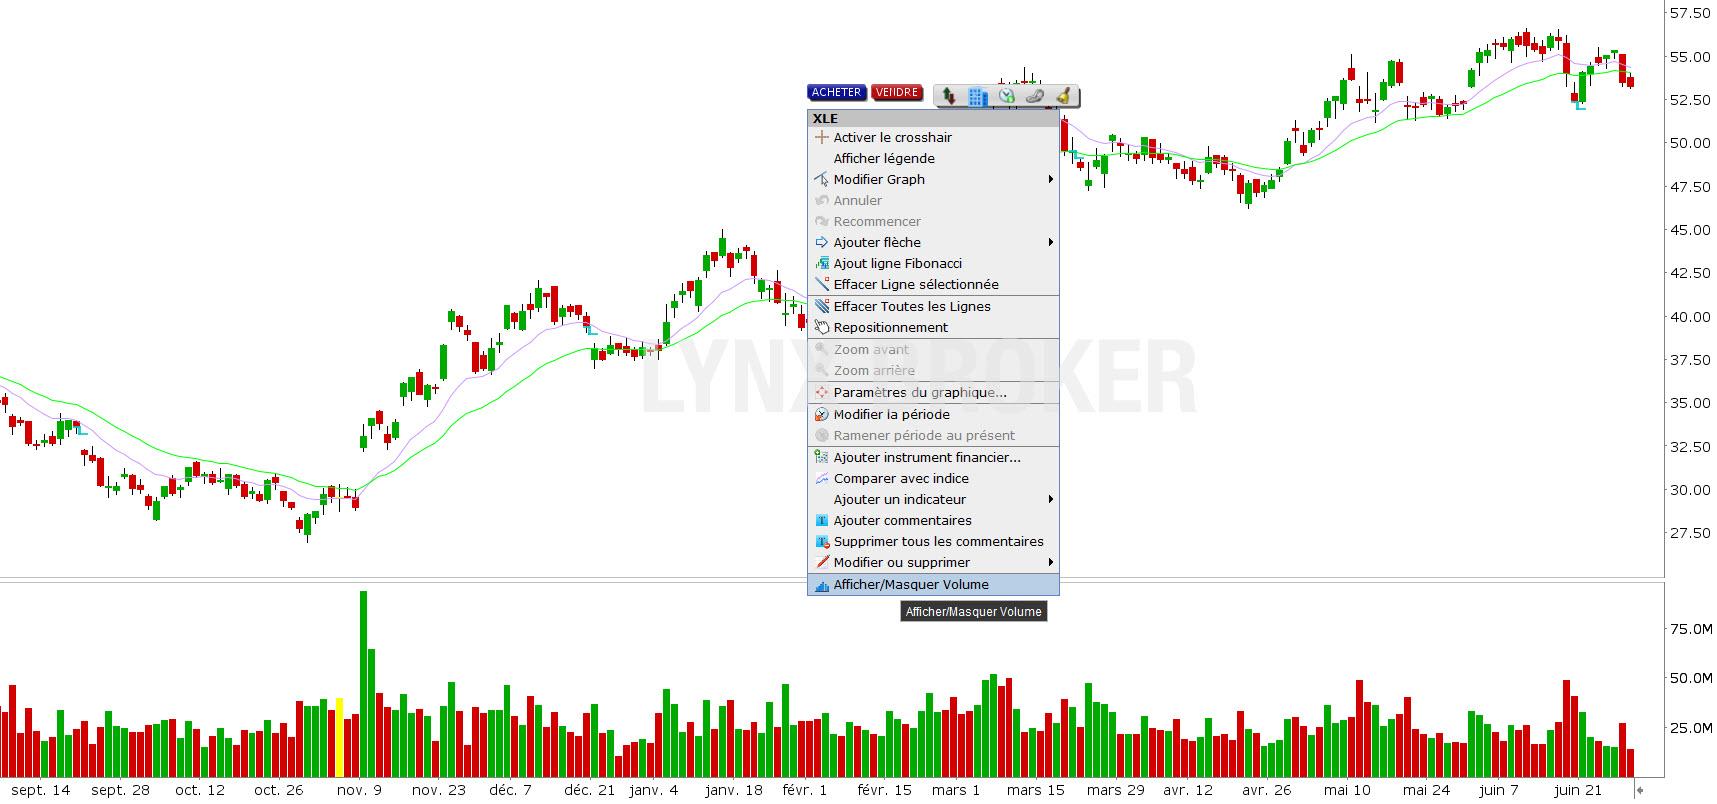 volume actions - volume trading - exemple plateforme de trading LYNX BROKER